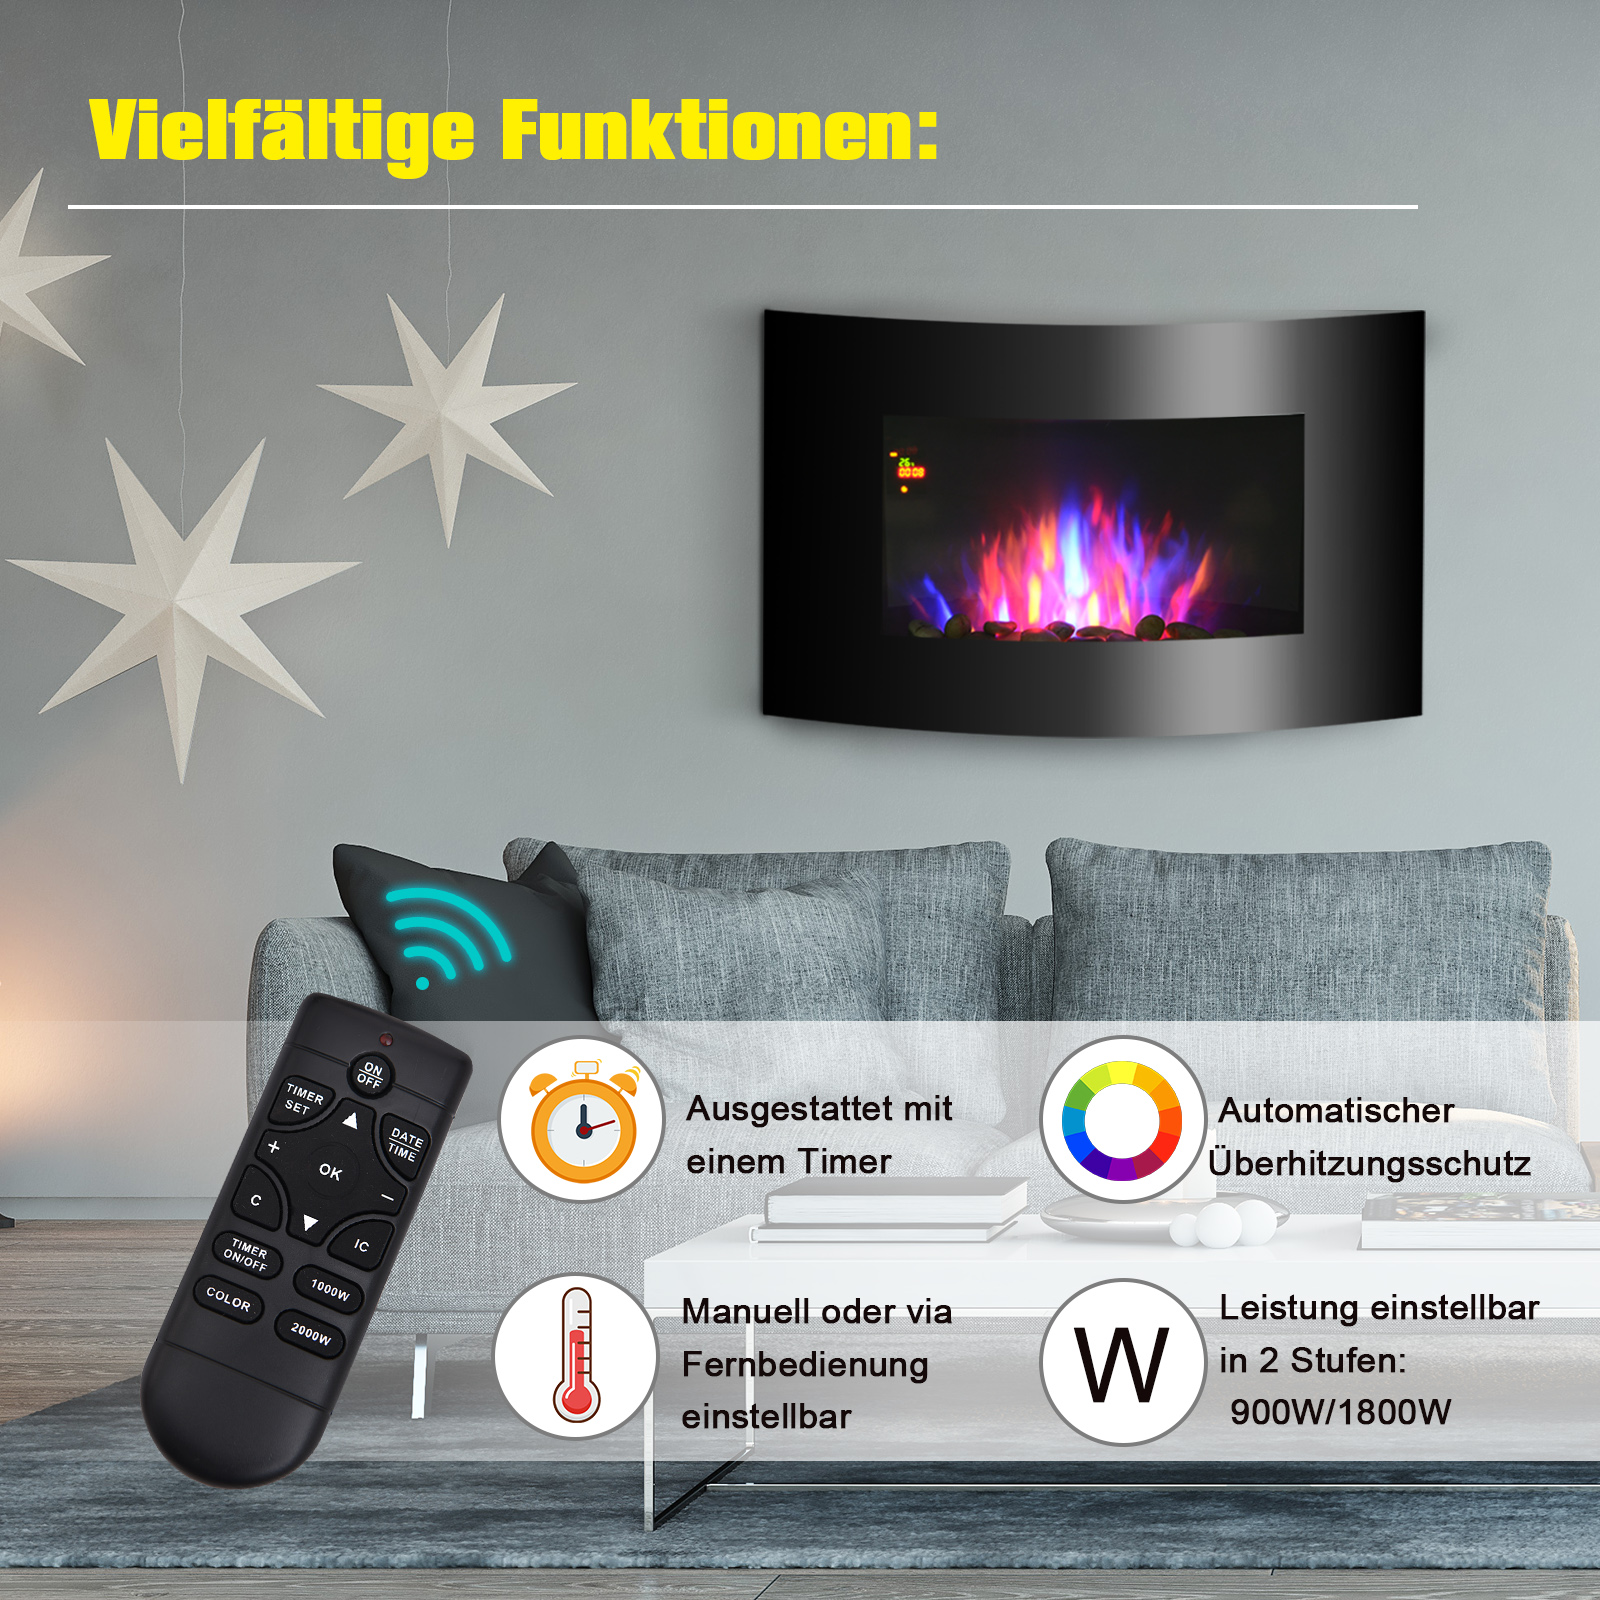 Elektrokamin-Elektrisch-Wandkamin-Kaminofen-LED-Kies-Edelstahl-1800W-Heize Indexbild 2